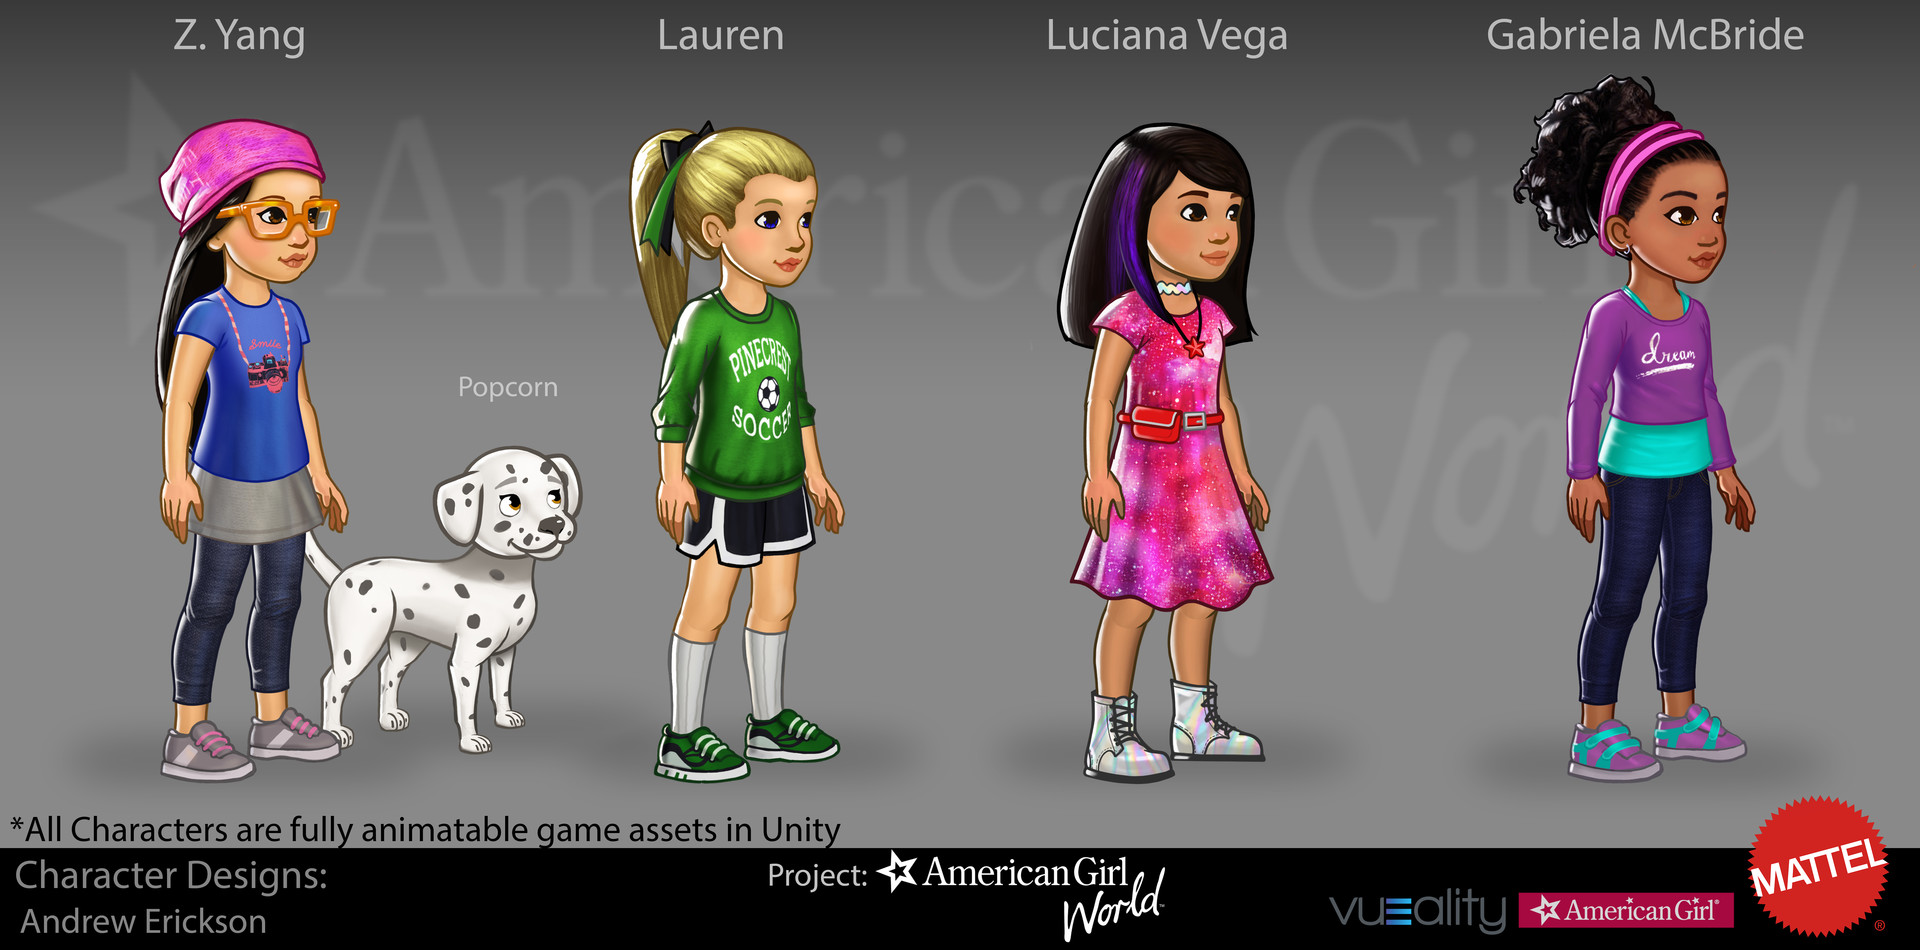 andrew-erickson-1-character-designs-american-girl-world-andrewerickson.jpg